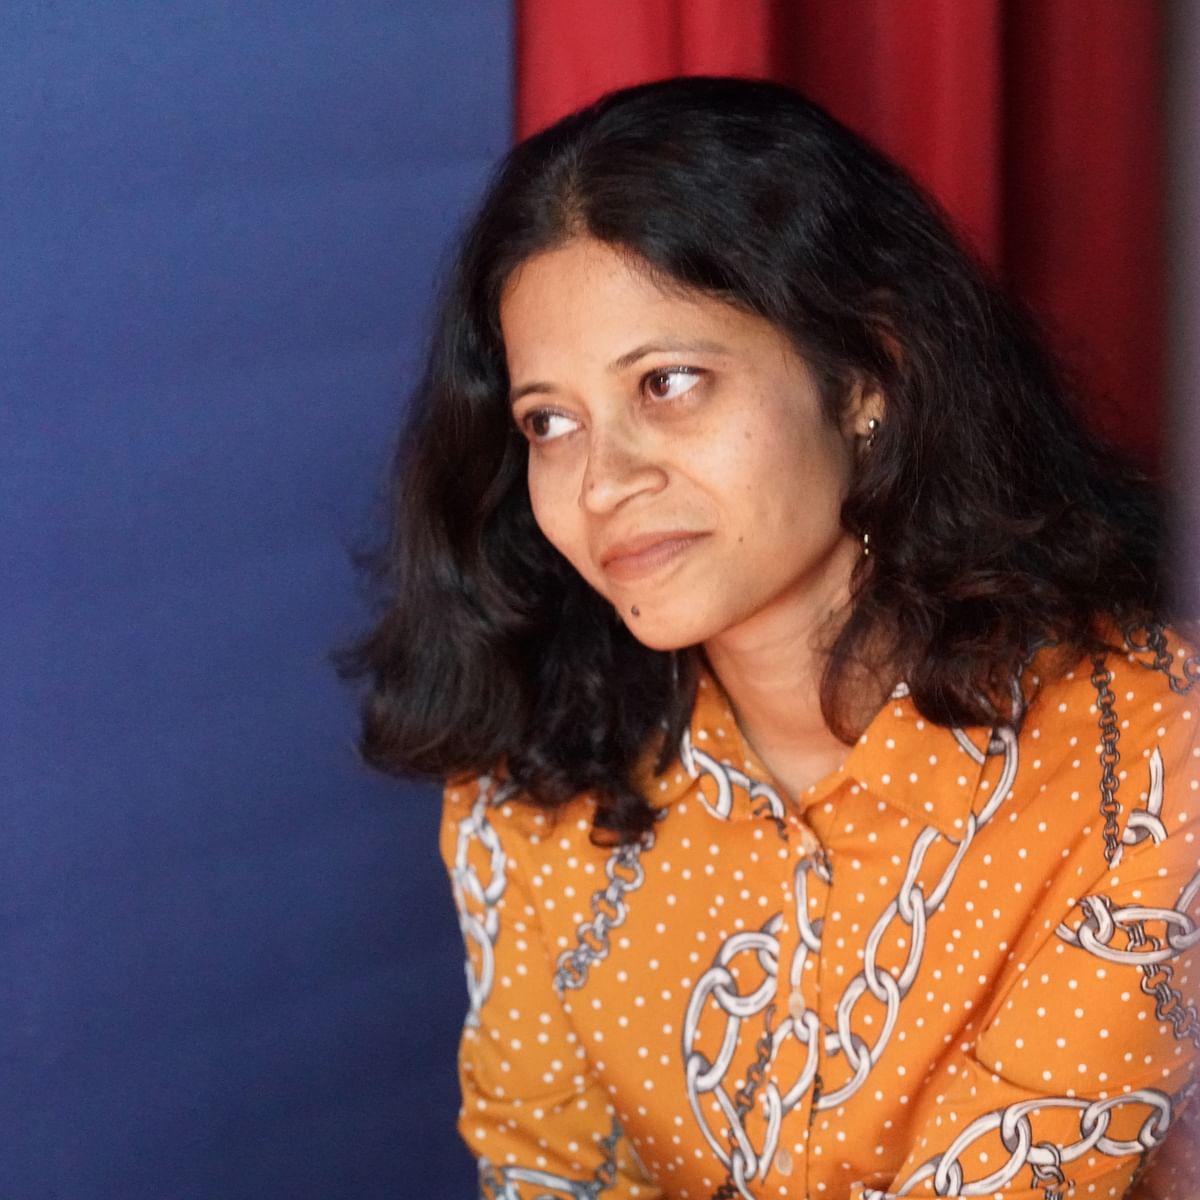 FPJ Interview: Yoga Prana Vidya boosts self-healing capacity to fight coronavirus, says Vishakha Karnani